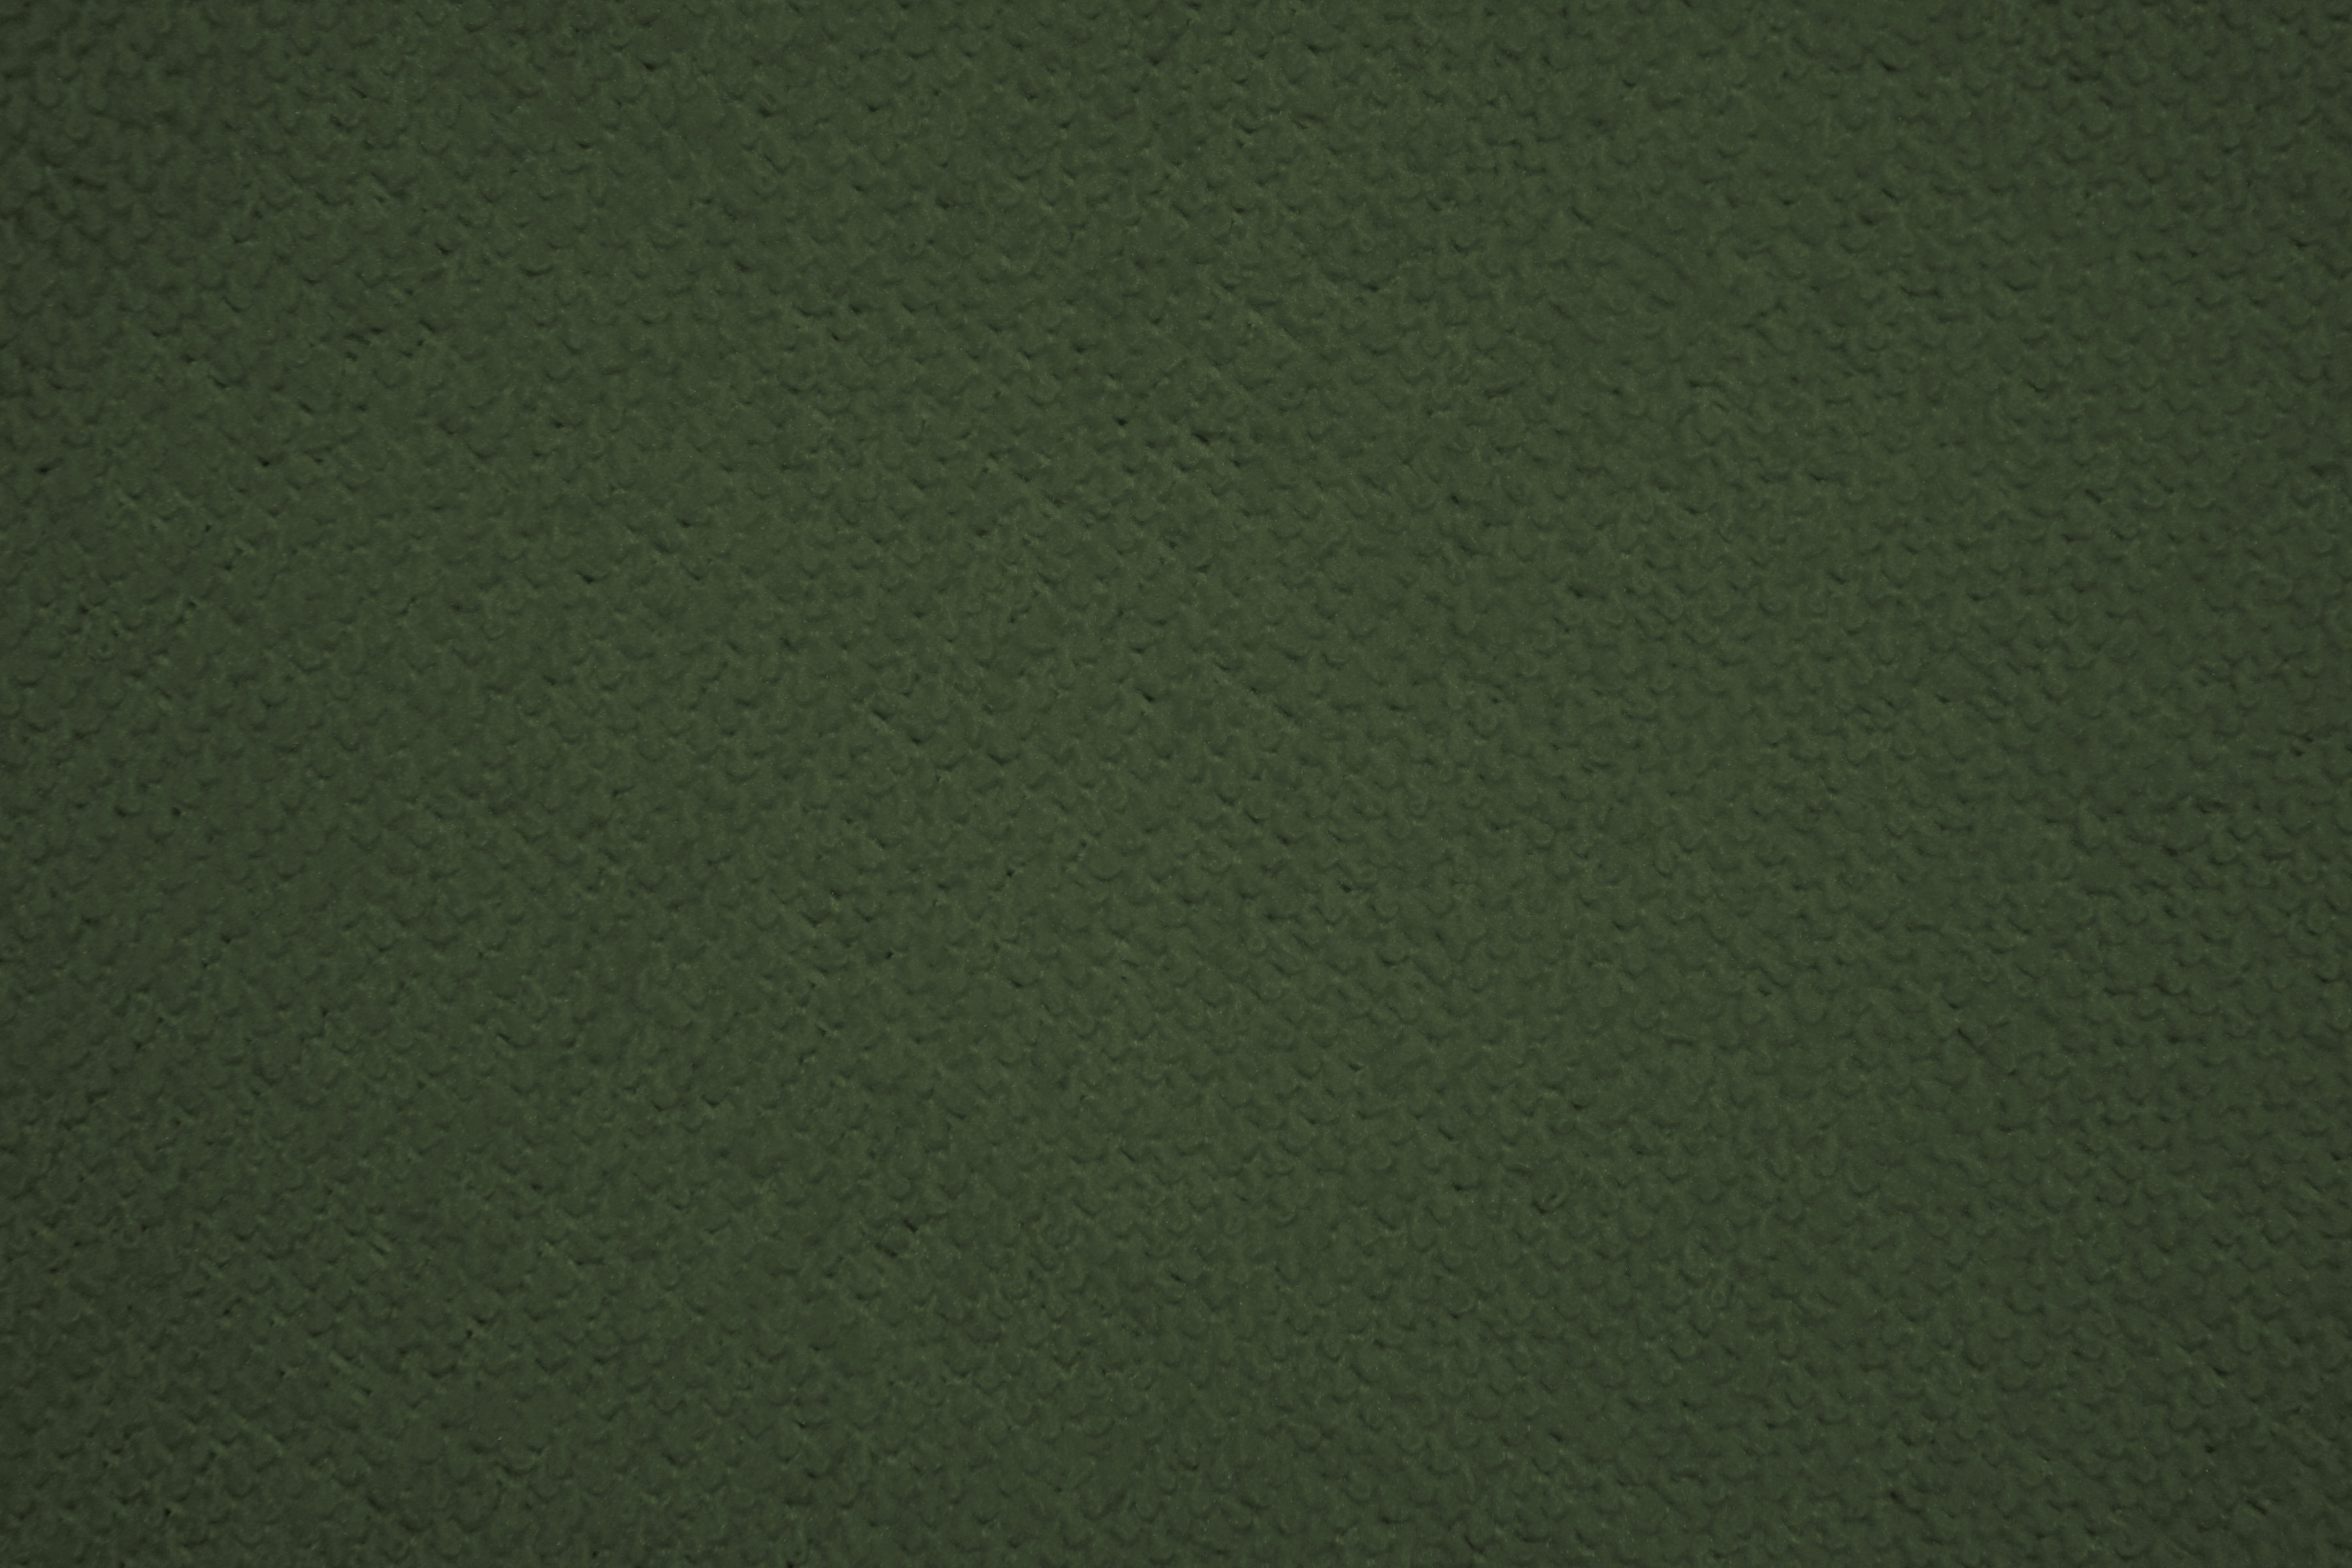 Olive Green Wallpaper 3600x2400